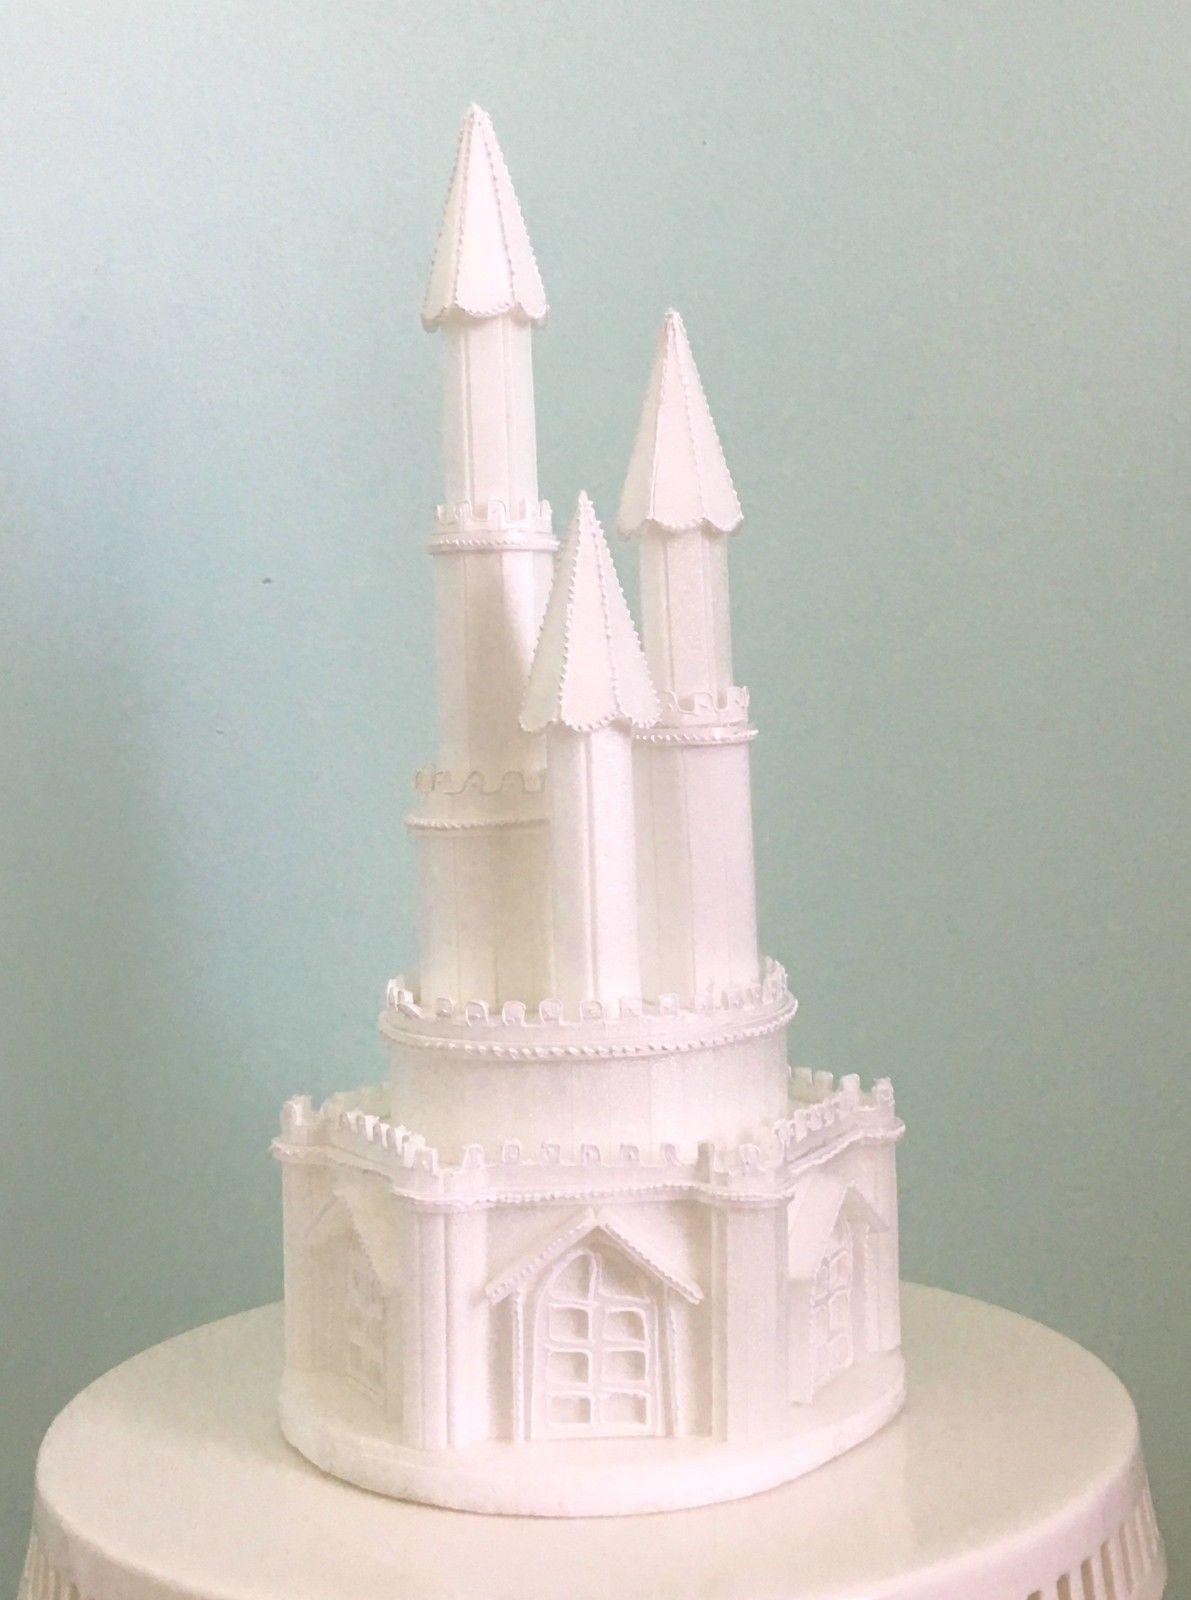 Sleeping Beauty Crystal Heart Wedding Cake Topper Engraved NEW**